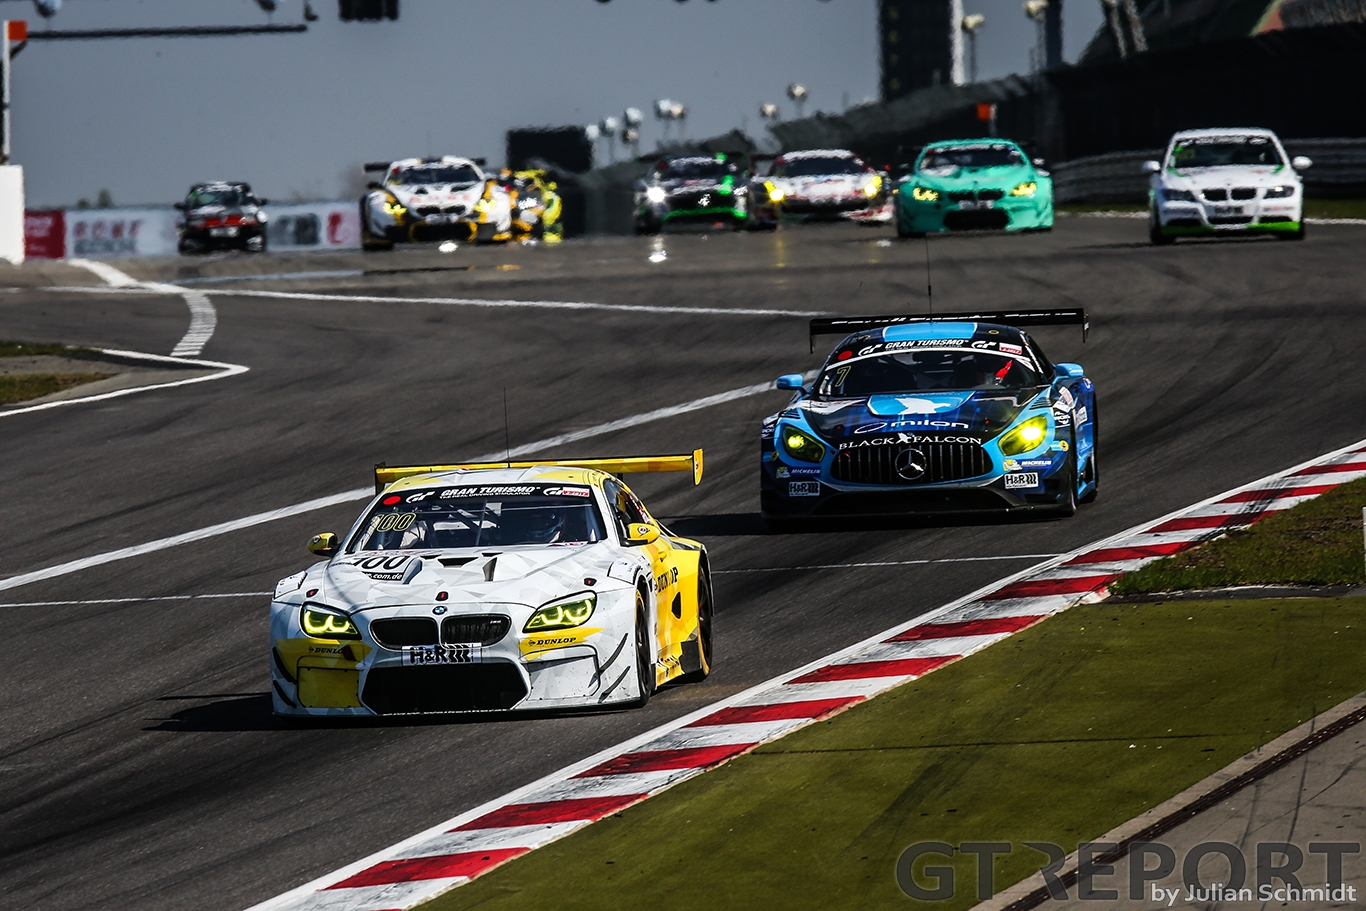 2017 VLN02 Christian Krognes 05 Julian Schmidt GT REPORT